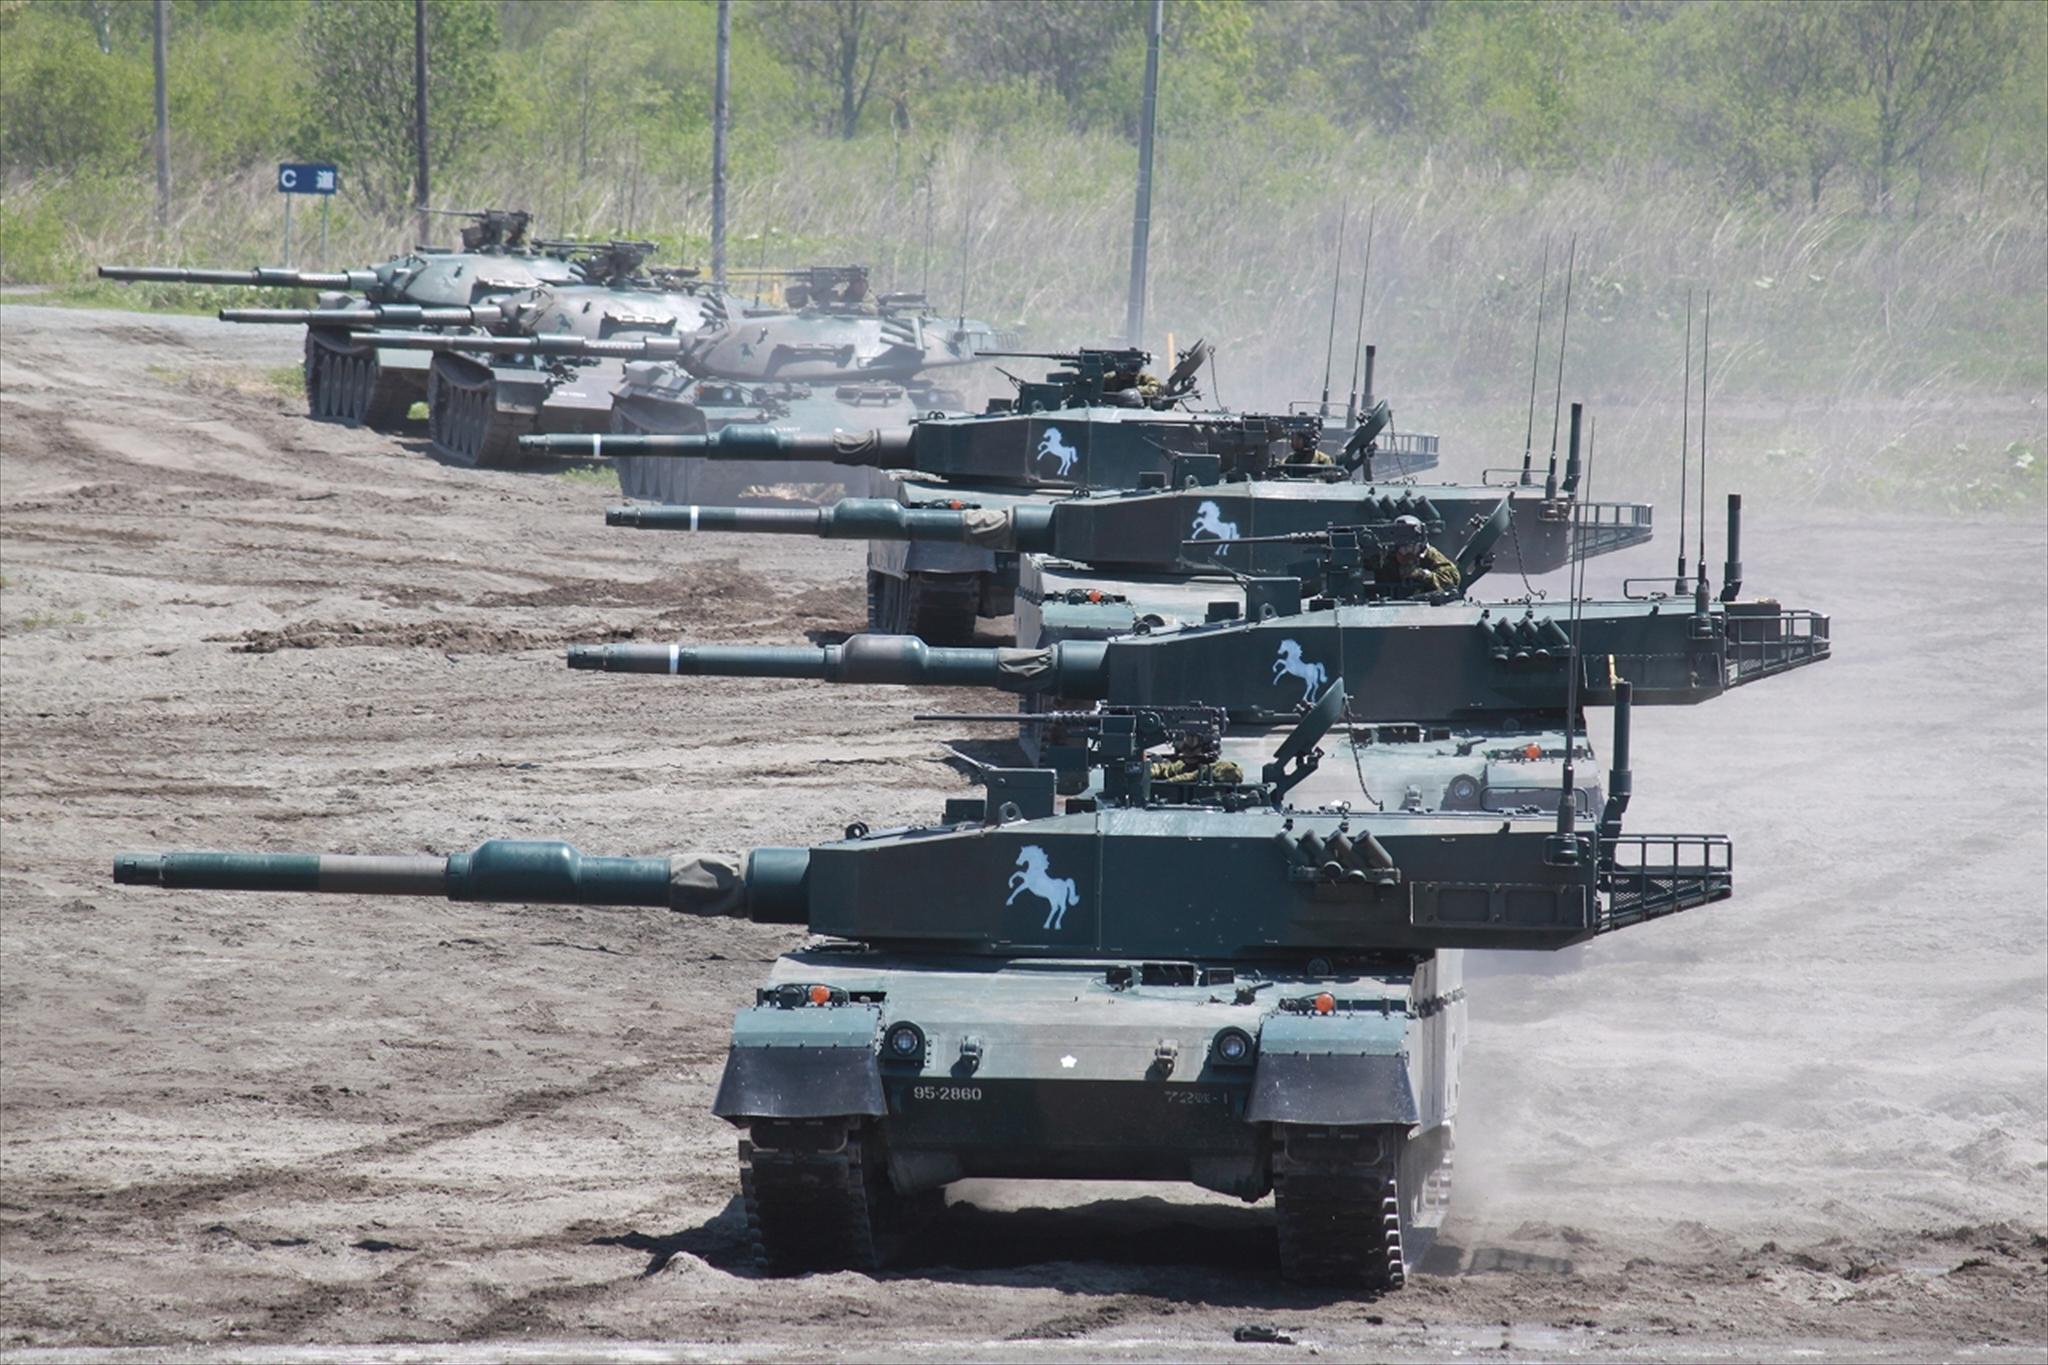 File 90式戦車 24 05 27 72tkr 先遣中隊の攻撃 訓練展示 24 5